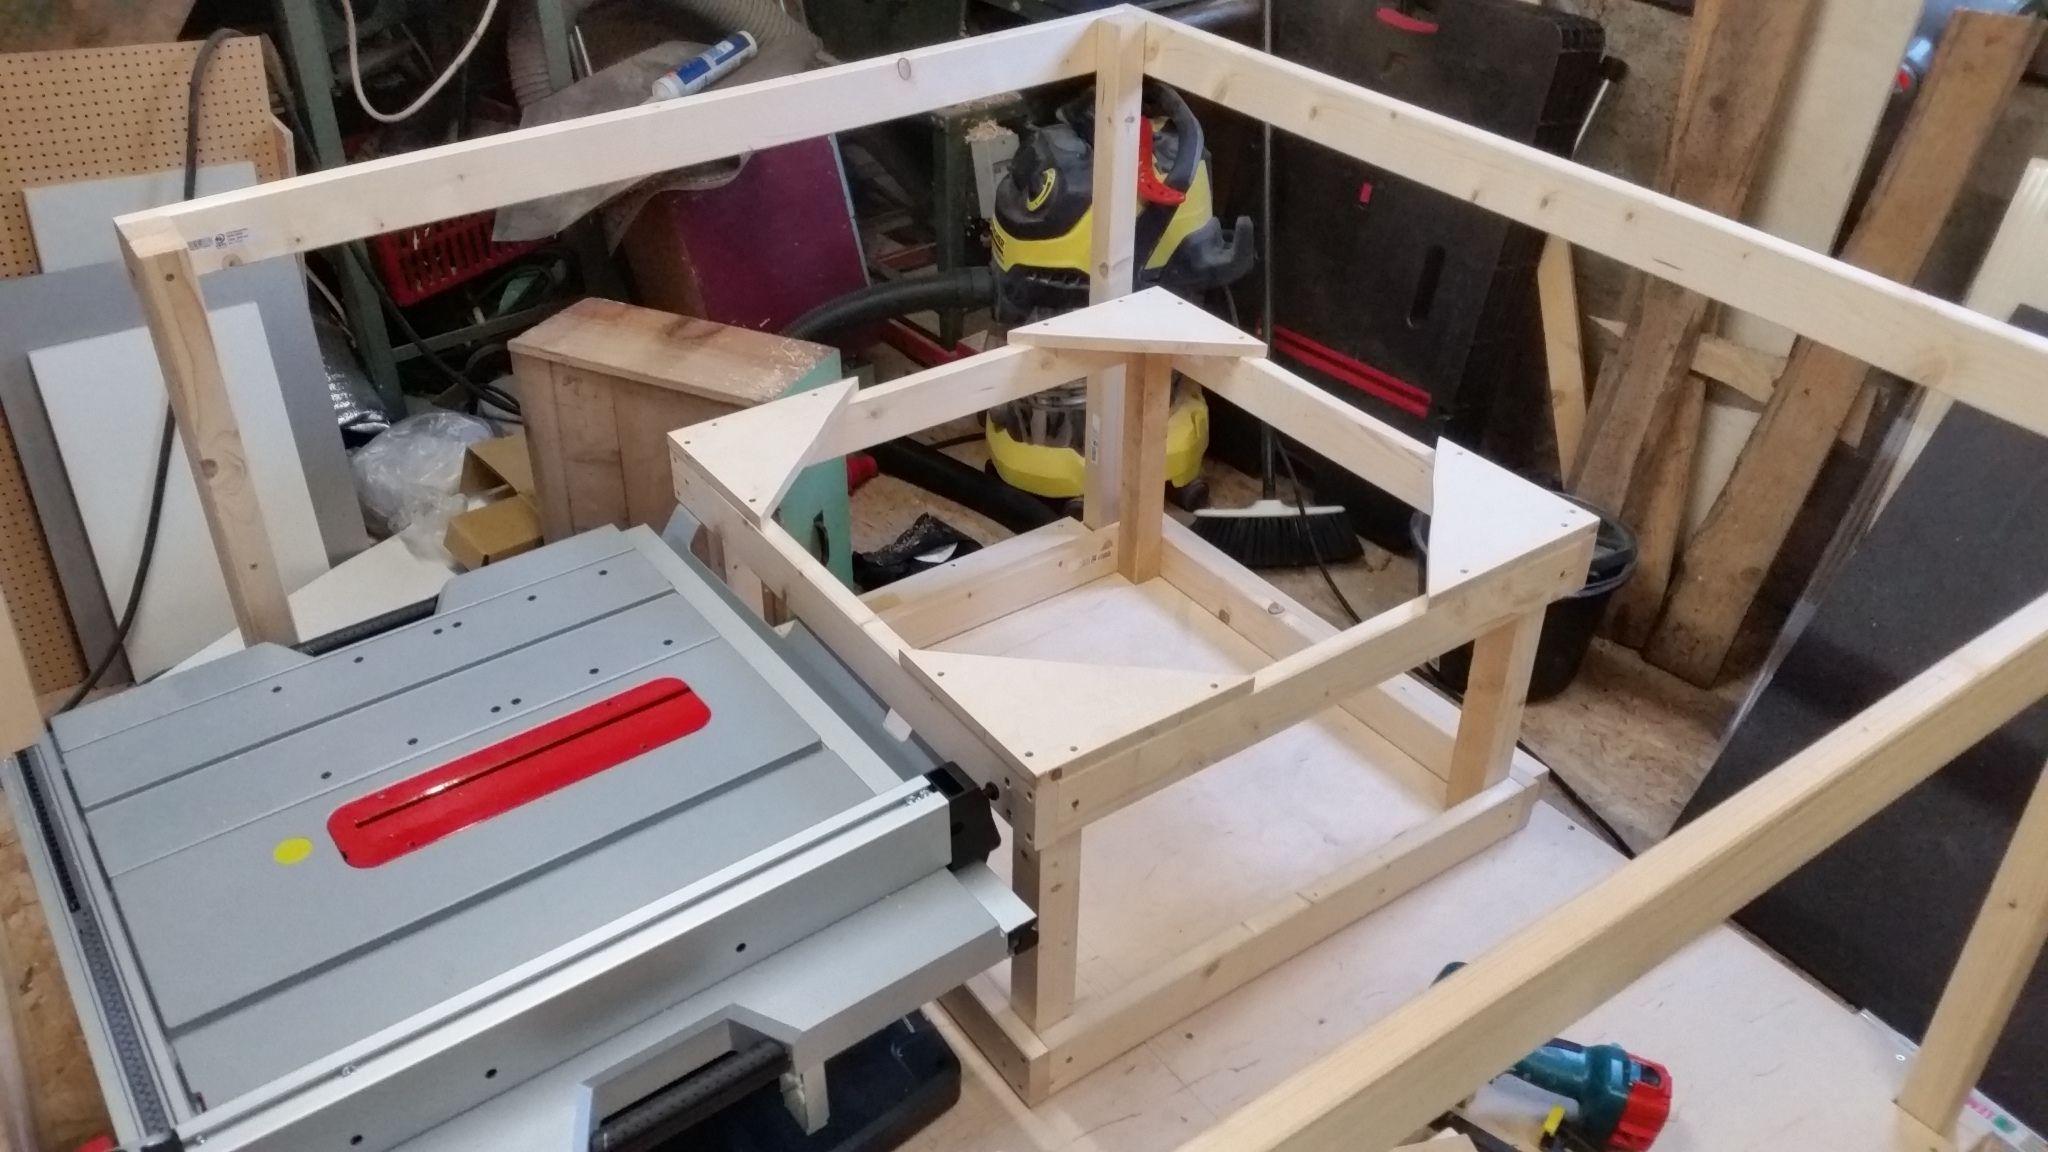 bosch gts 10 xc bauanleitung zum selber bauen | heimwerker-forum